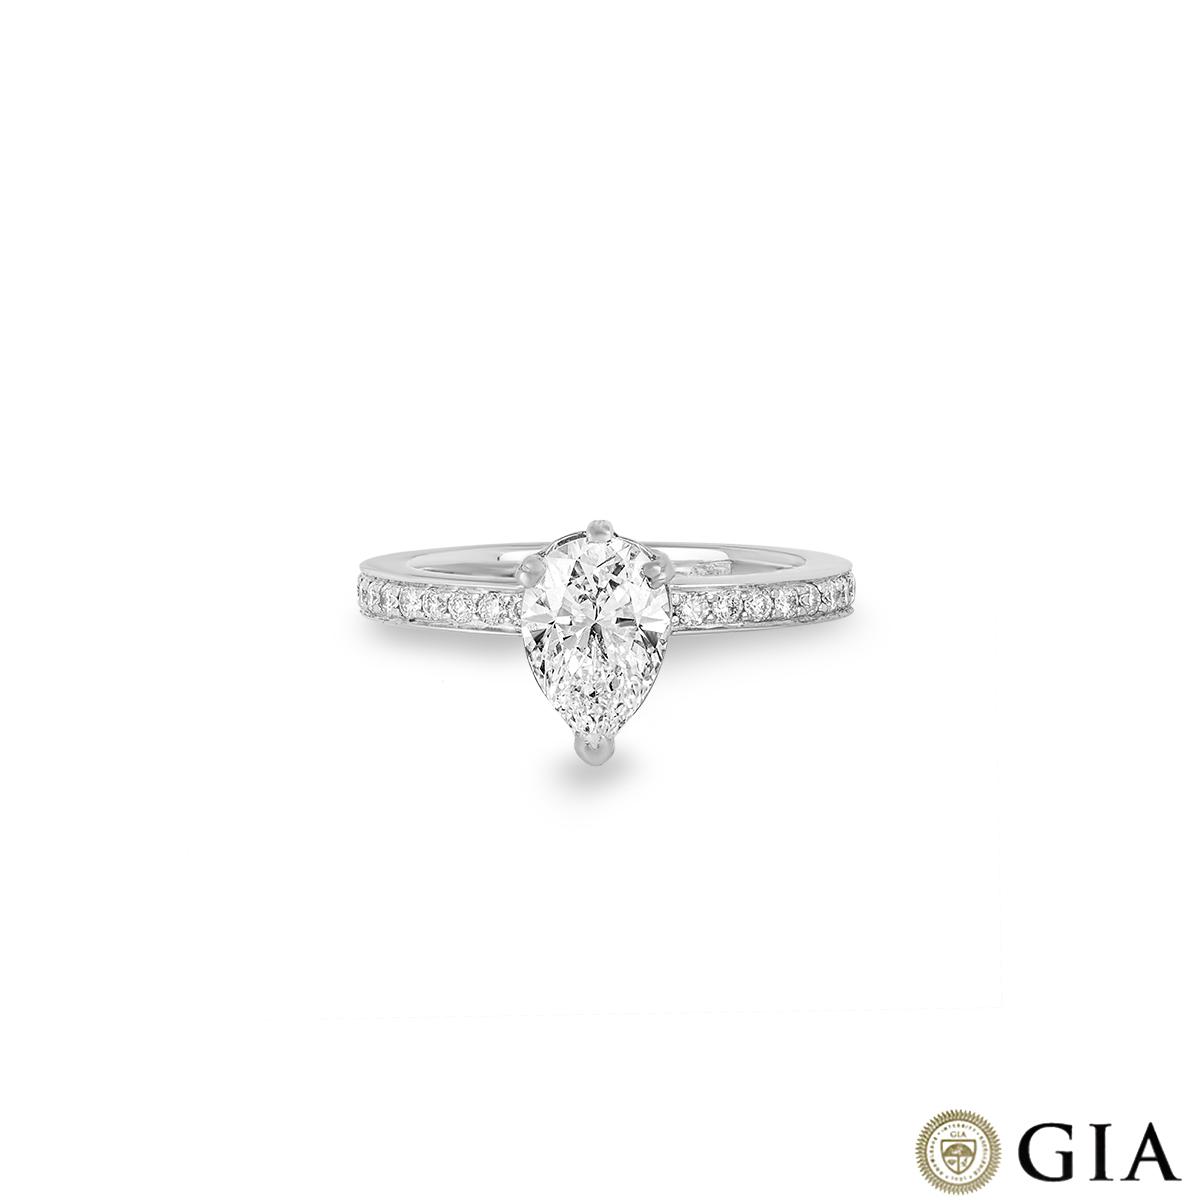 Platinum Diamond Ring 1.21 G/VS1